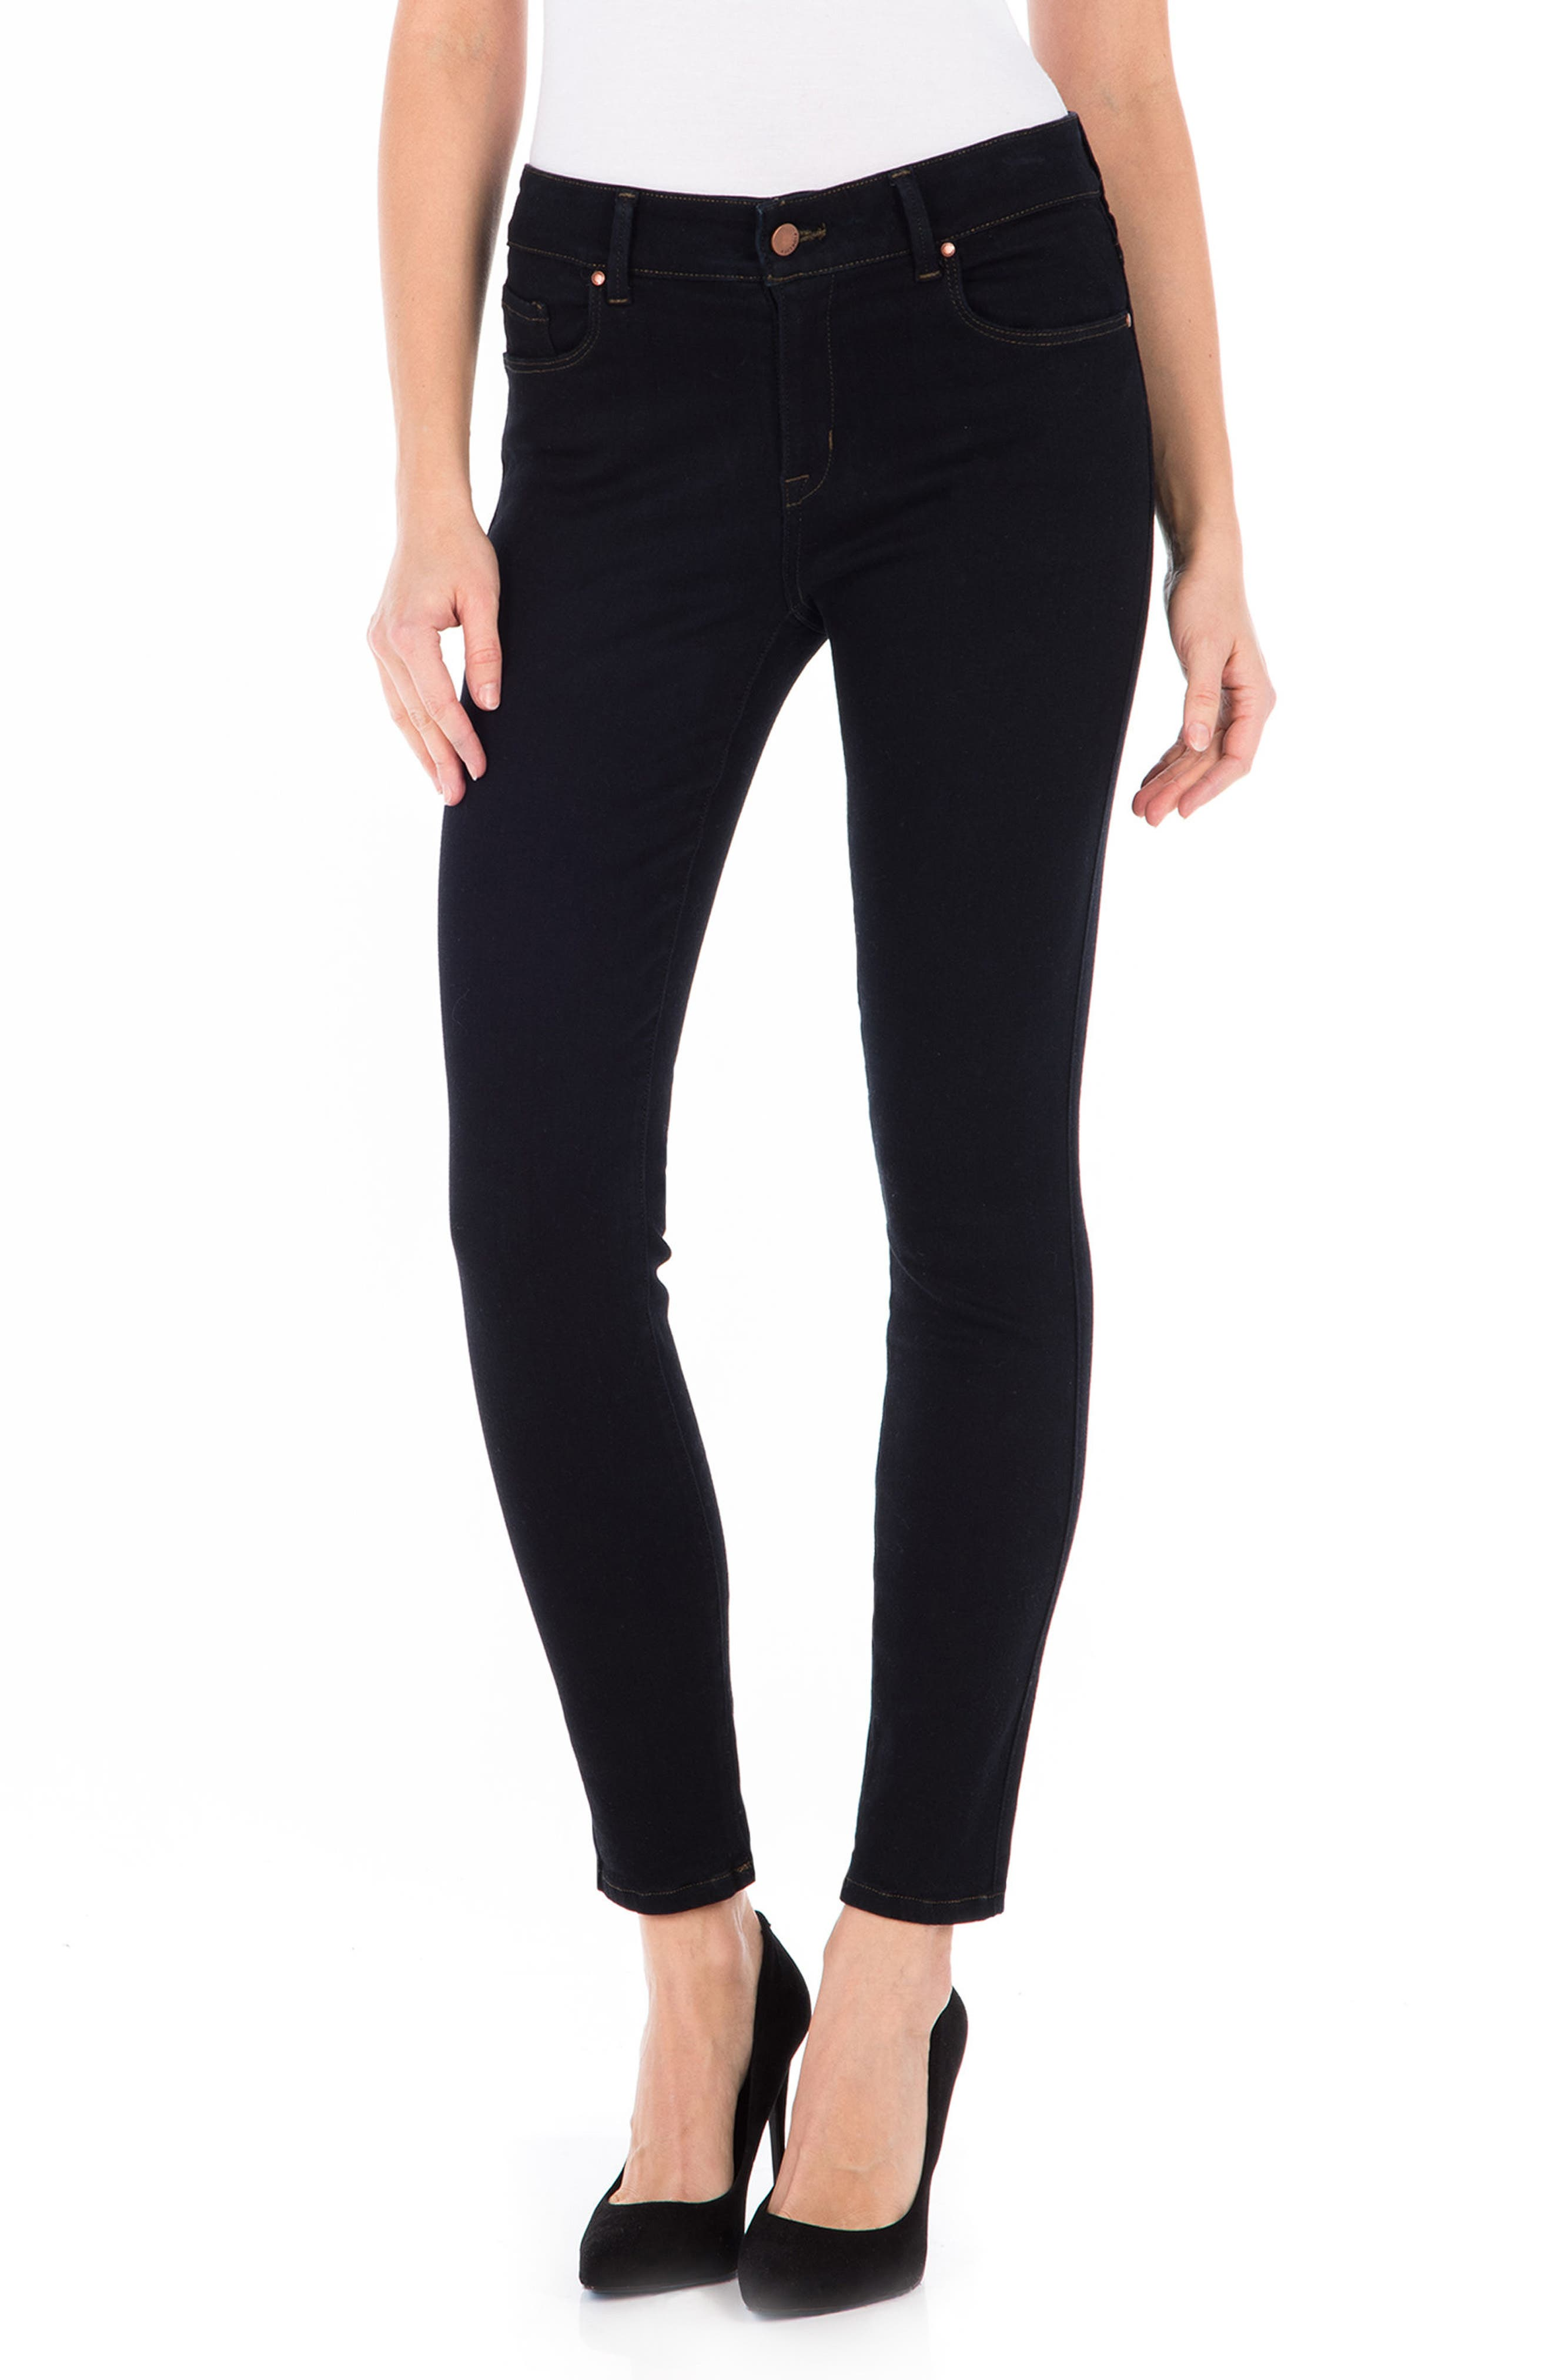 Main Image - Fidelity Denim Sola Skinny Jeans (Navy Noir)